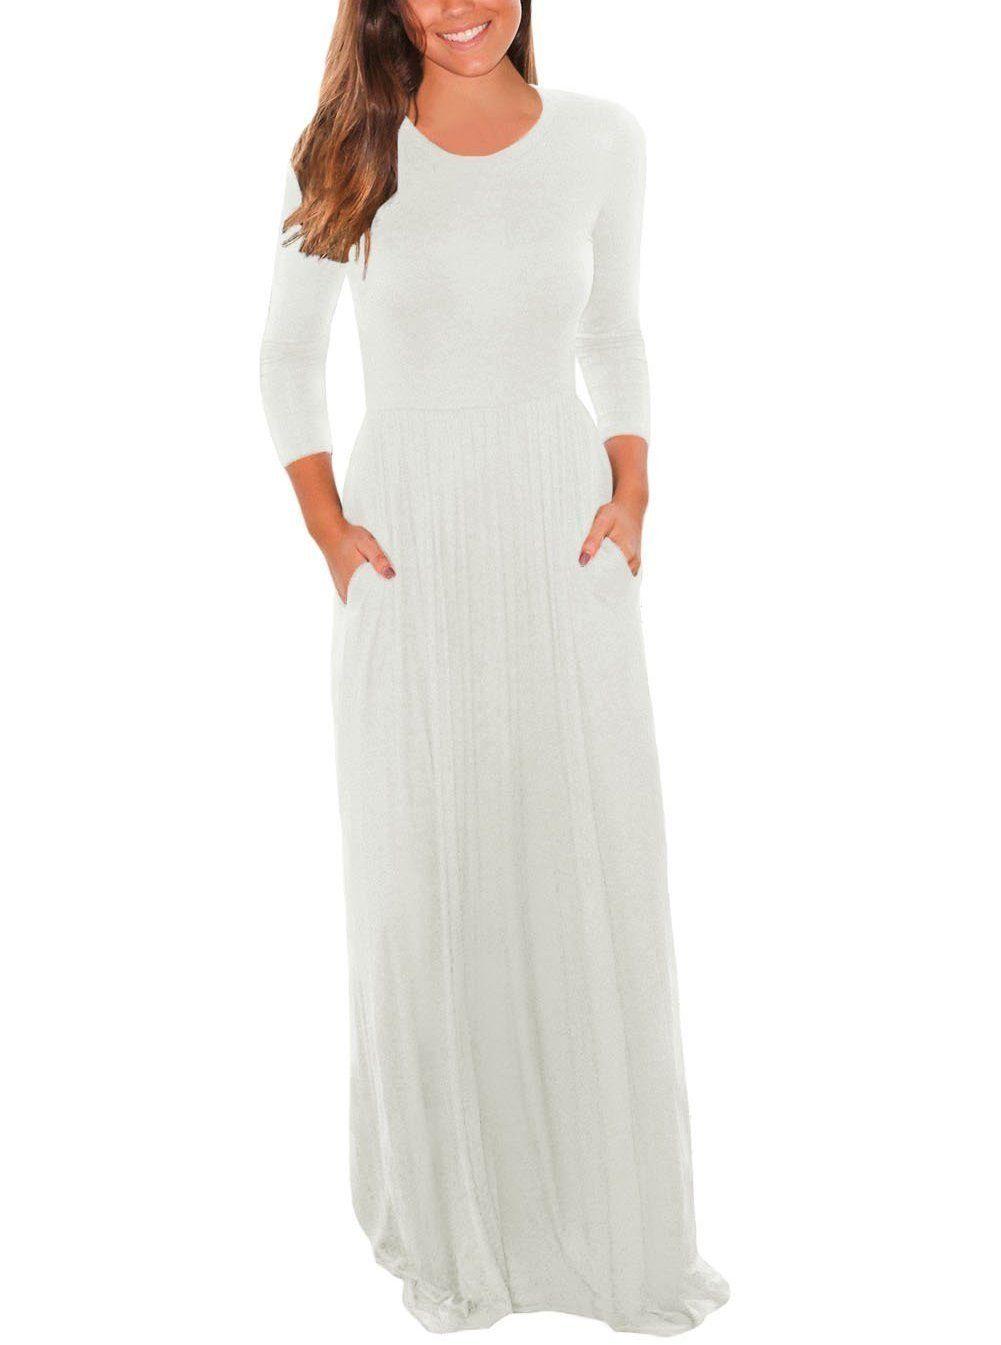 Pocket Design 3 4 Sleeves Maxi Dress Maxi Dress [ 1345 x 1001 Pixel ]